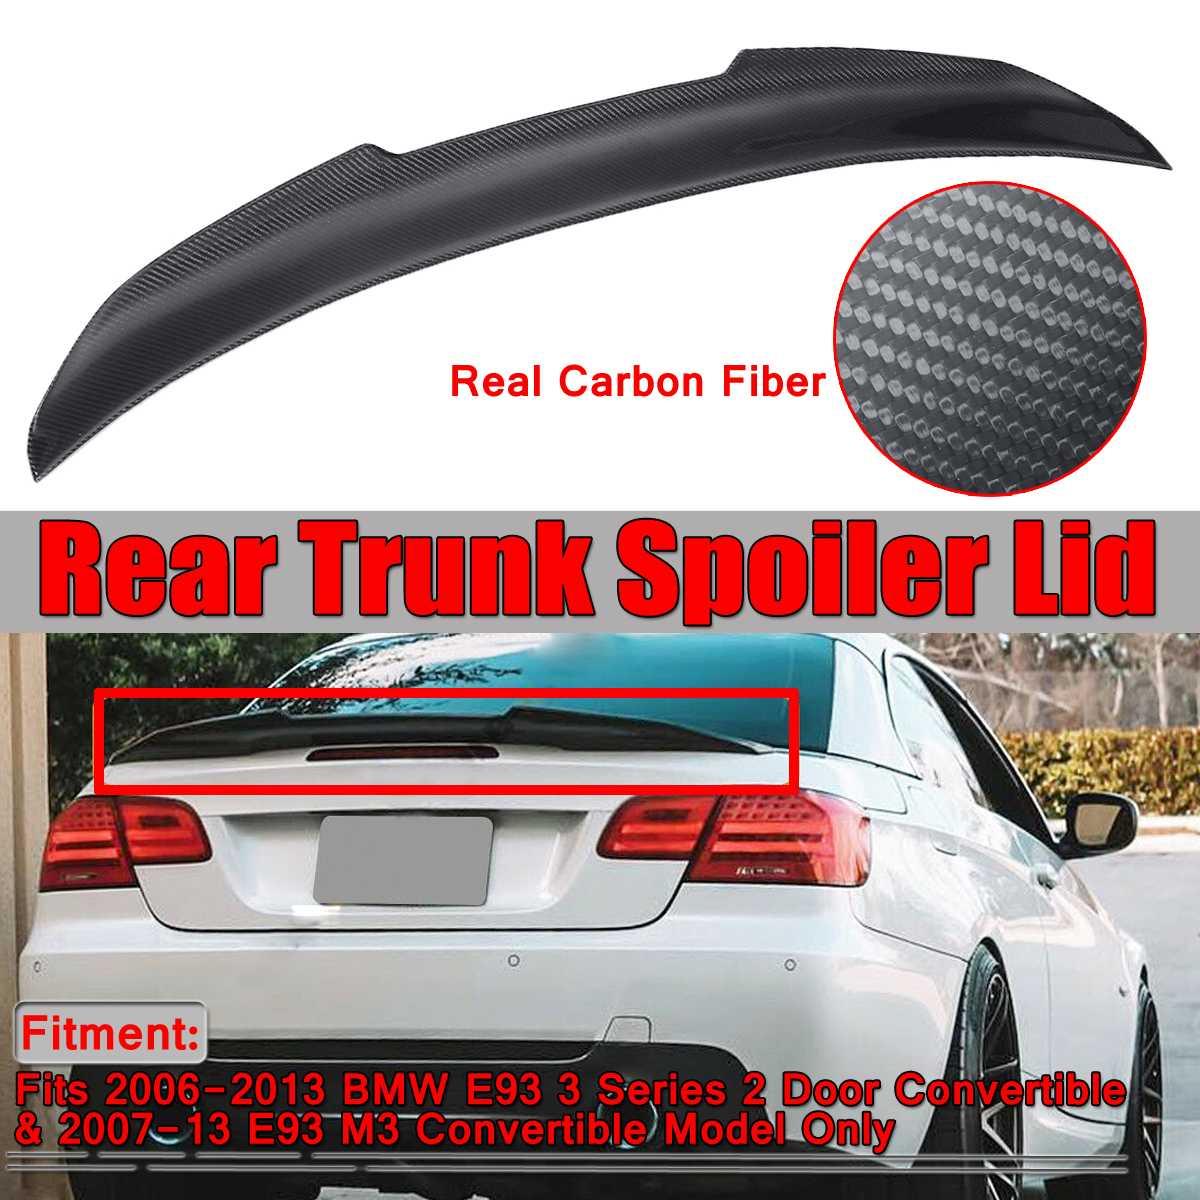 Carbon Fiber Rear Trunk Spoiler for 07-13 BMW E93 3 Series M3 Convertible Type D